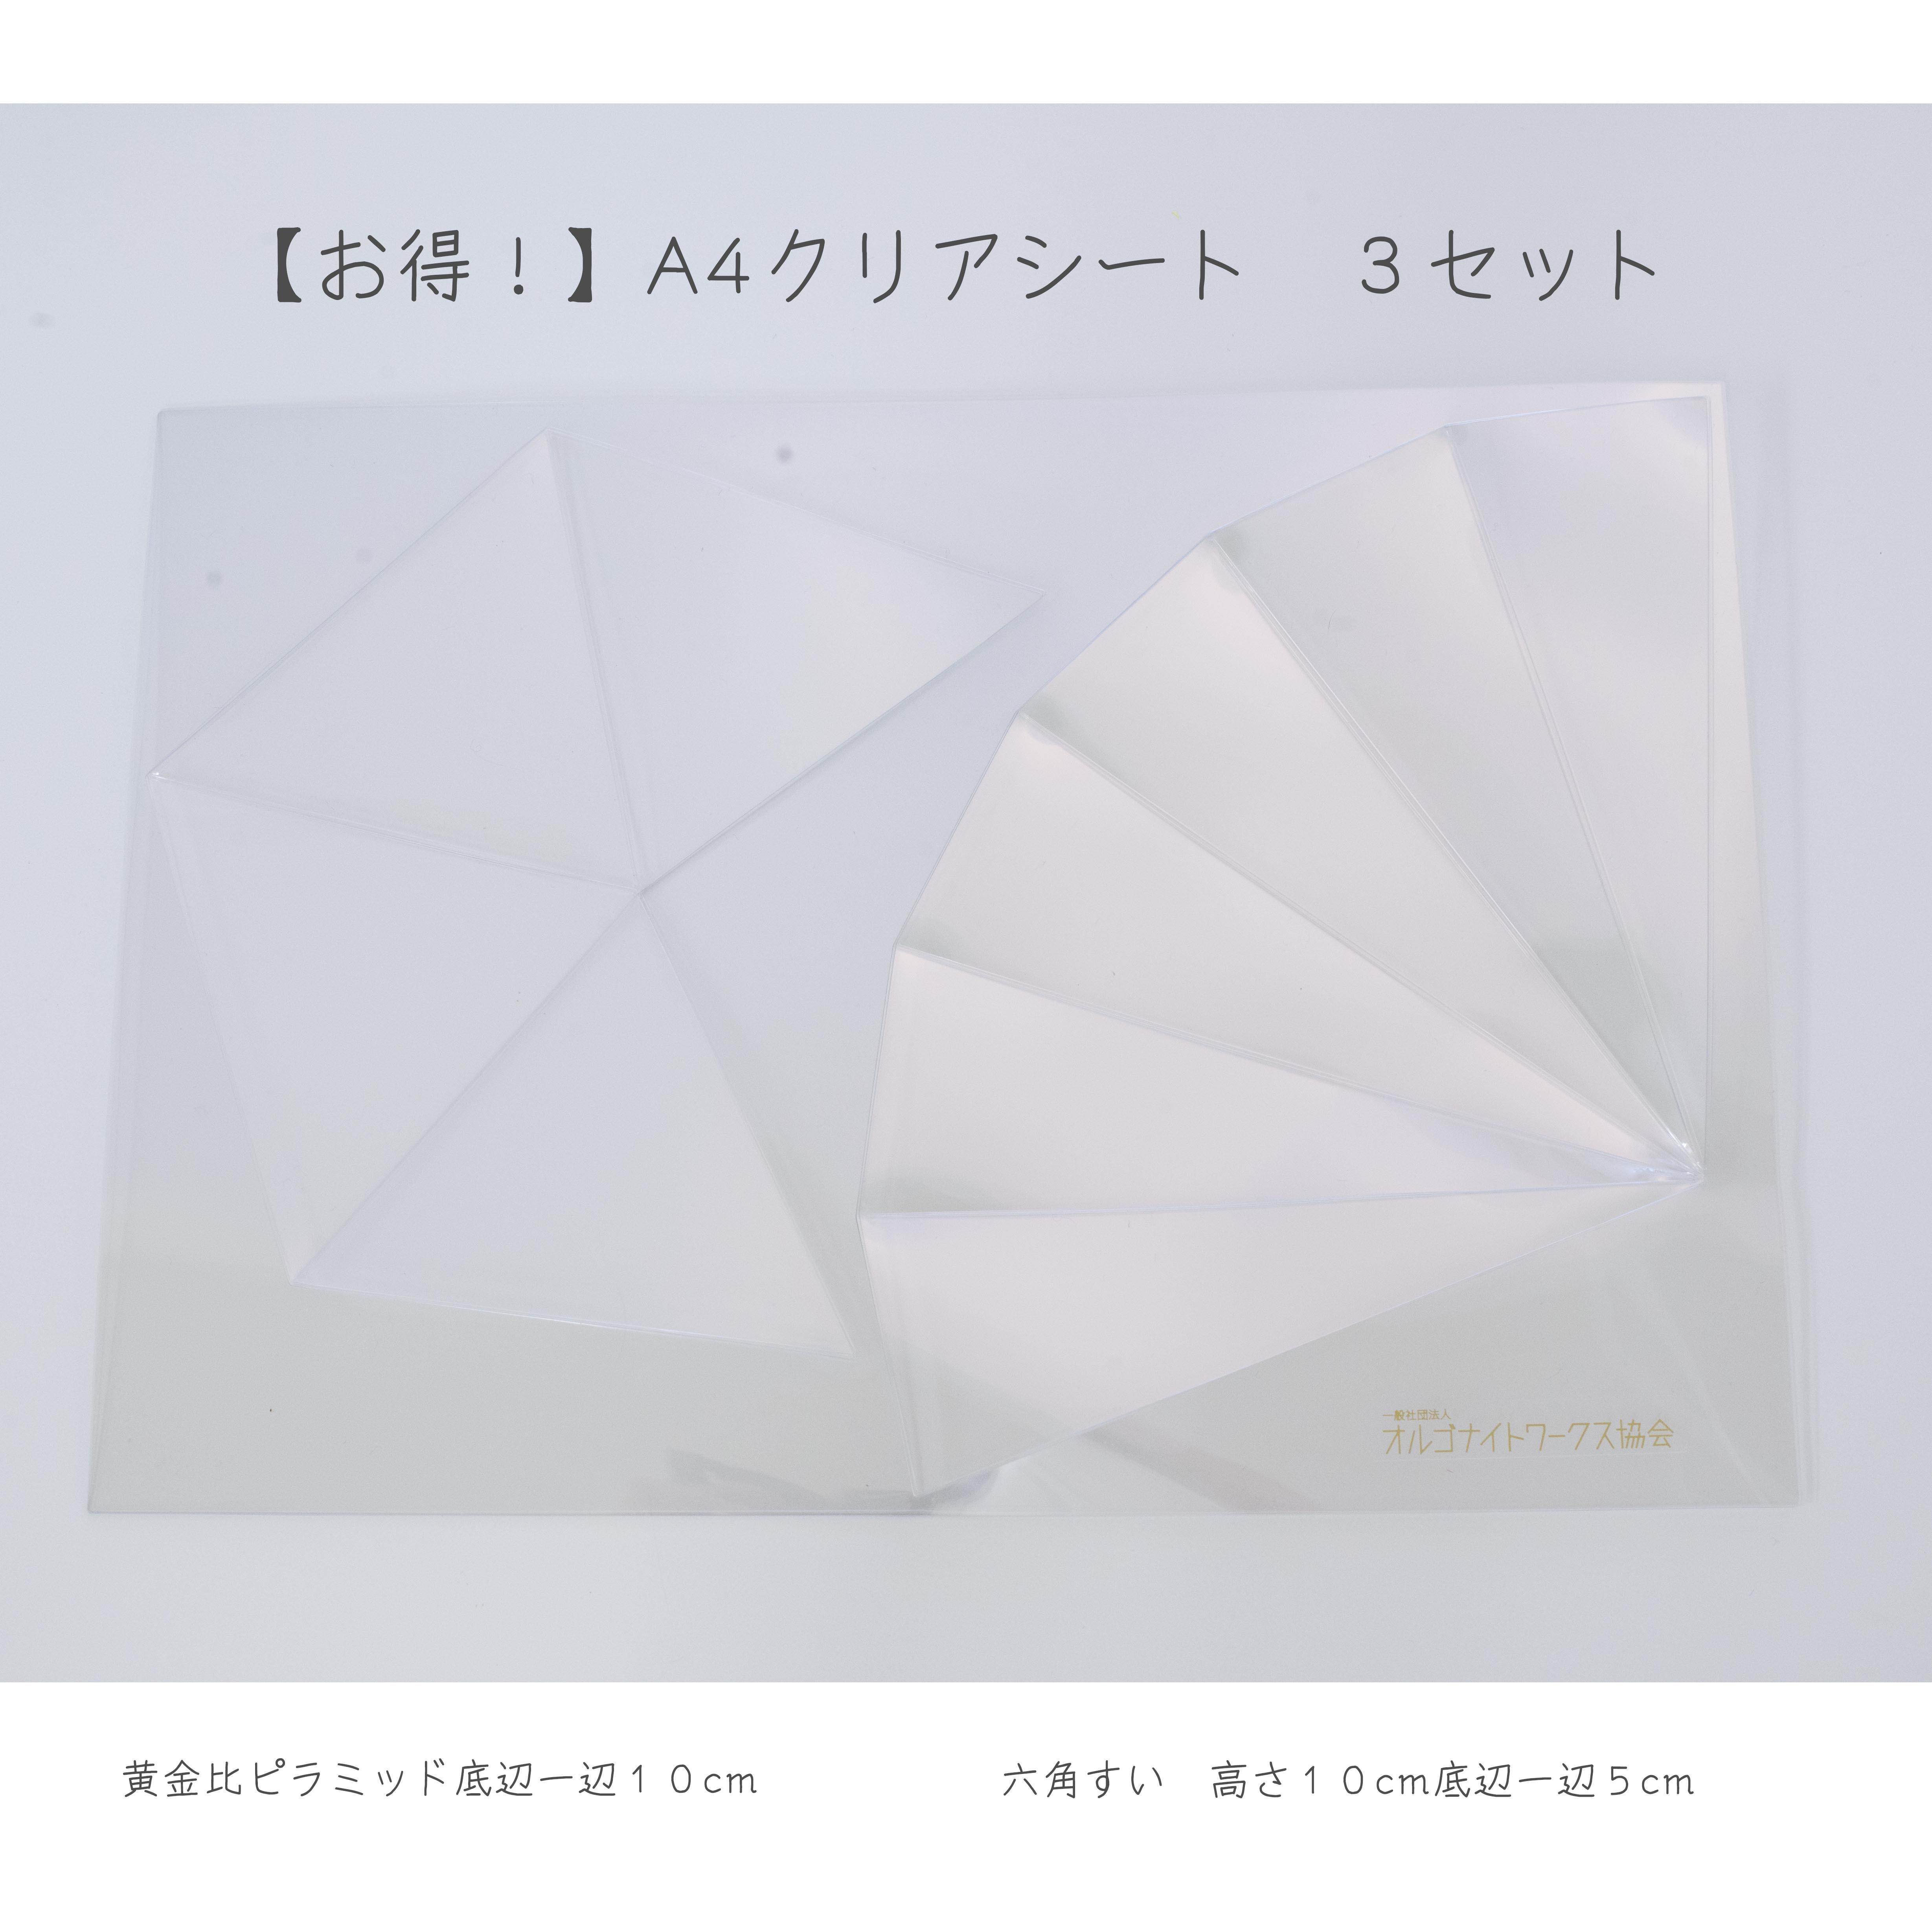 ✴︎3枚お得セット!✴︎協会オリジナルクリアシート型抜き【1セット2作品制作】